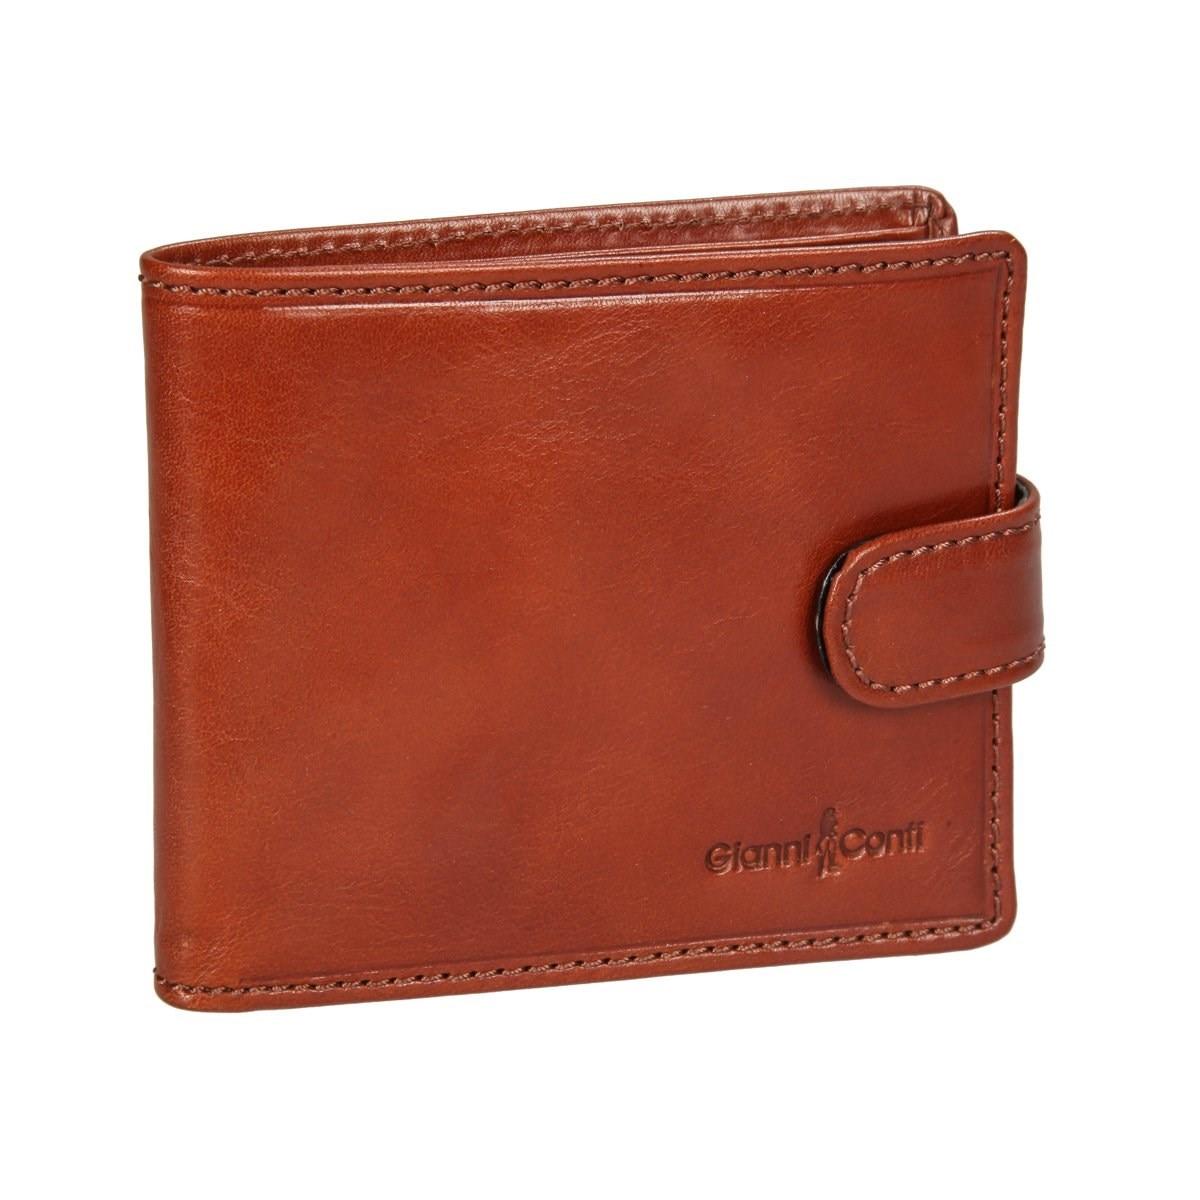 Coin Purse Gianni Conti 907075 Tan кожаные сумки gianni conti 912150 tan